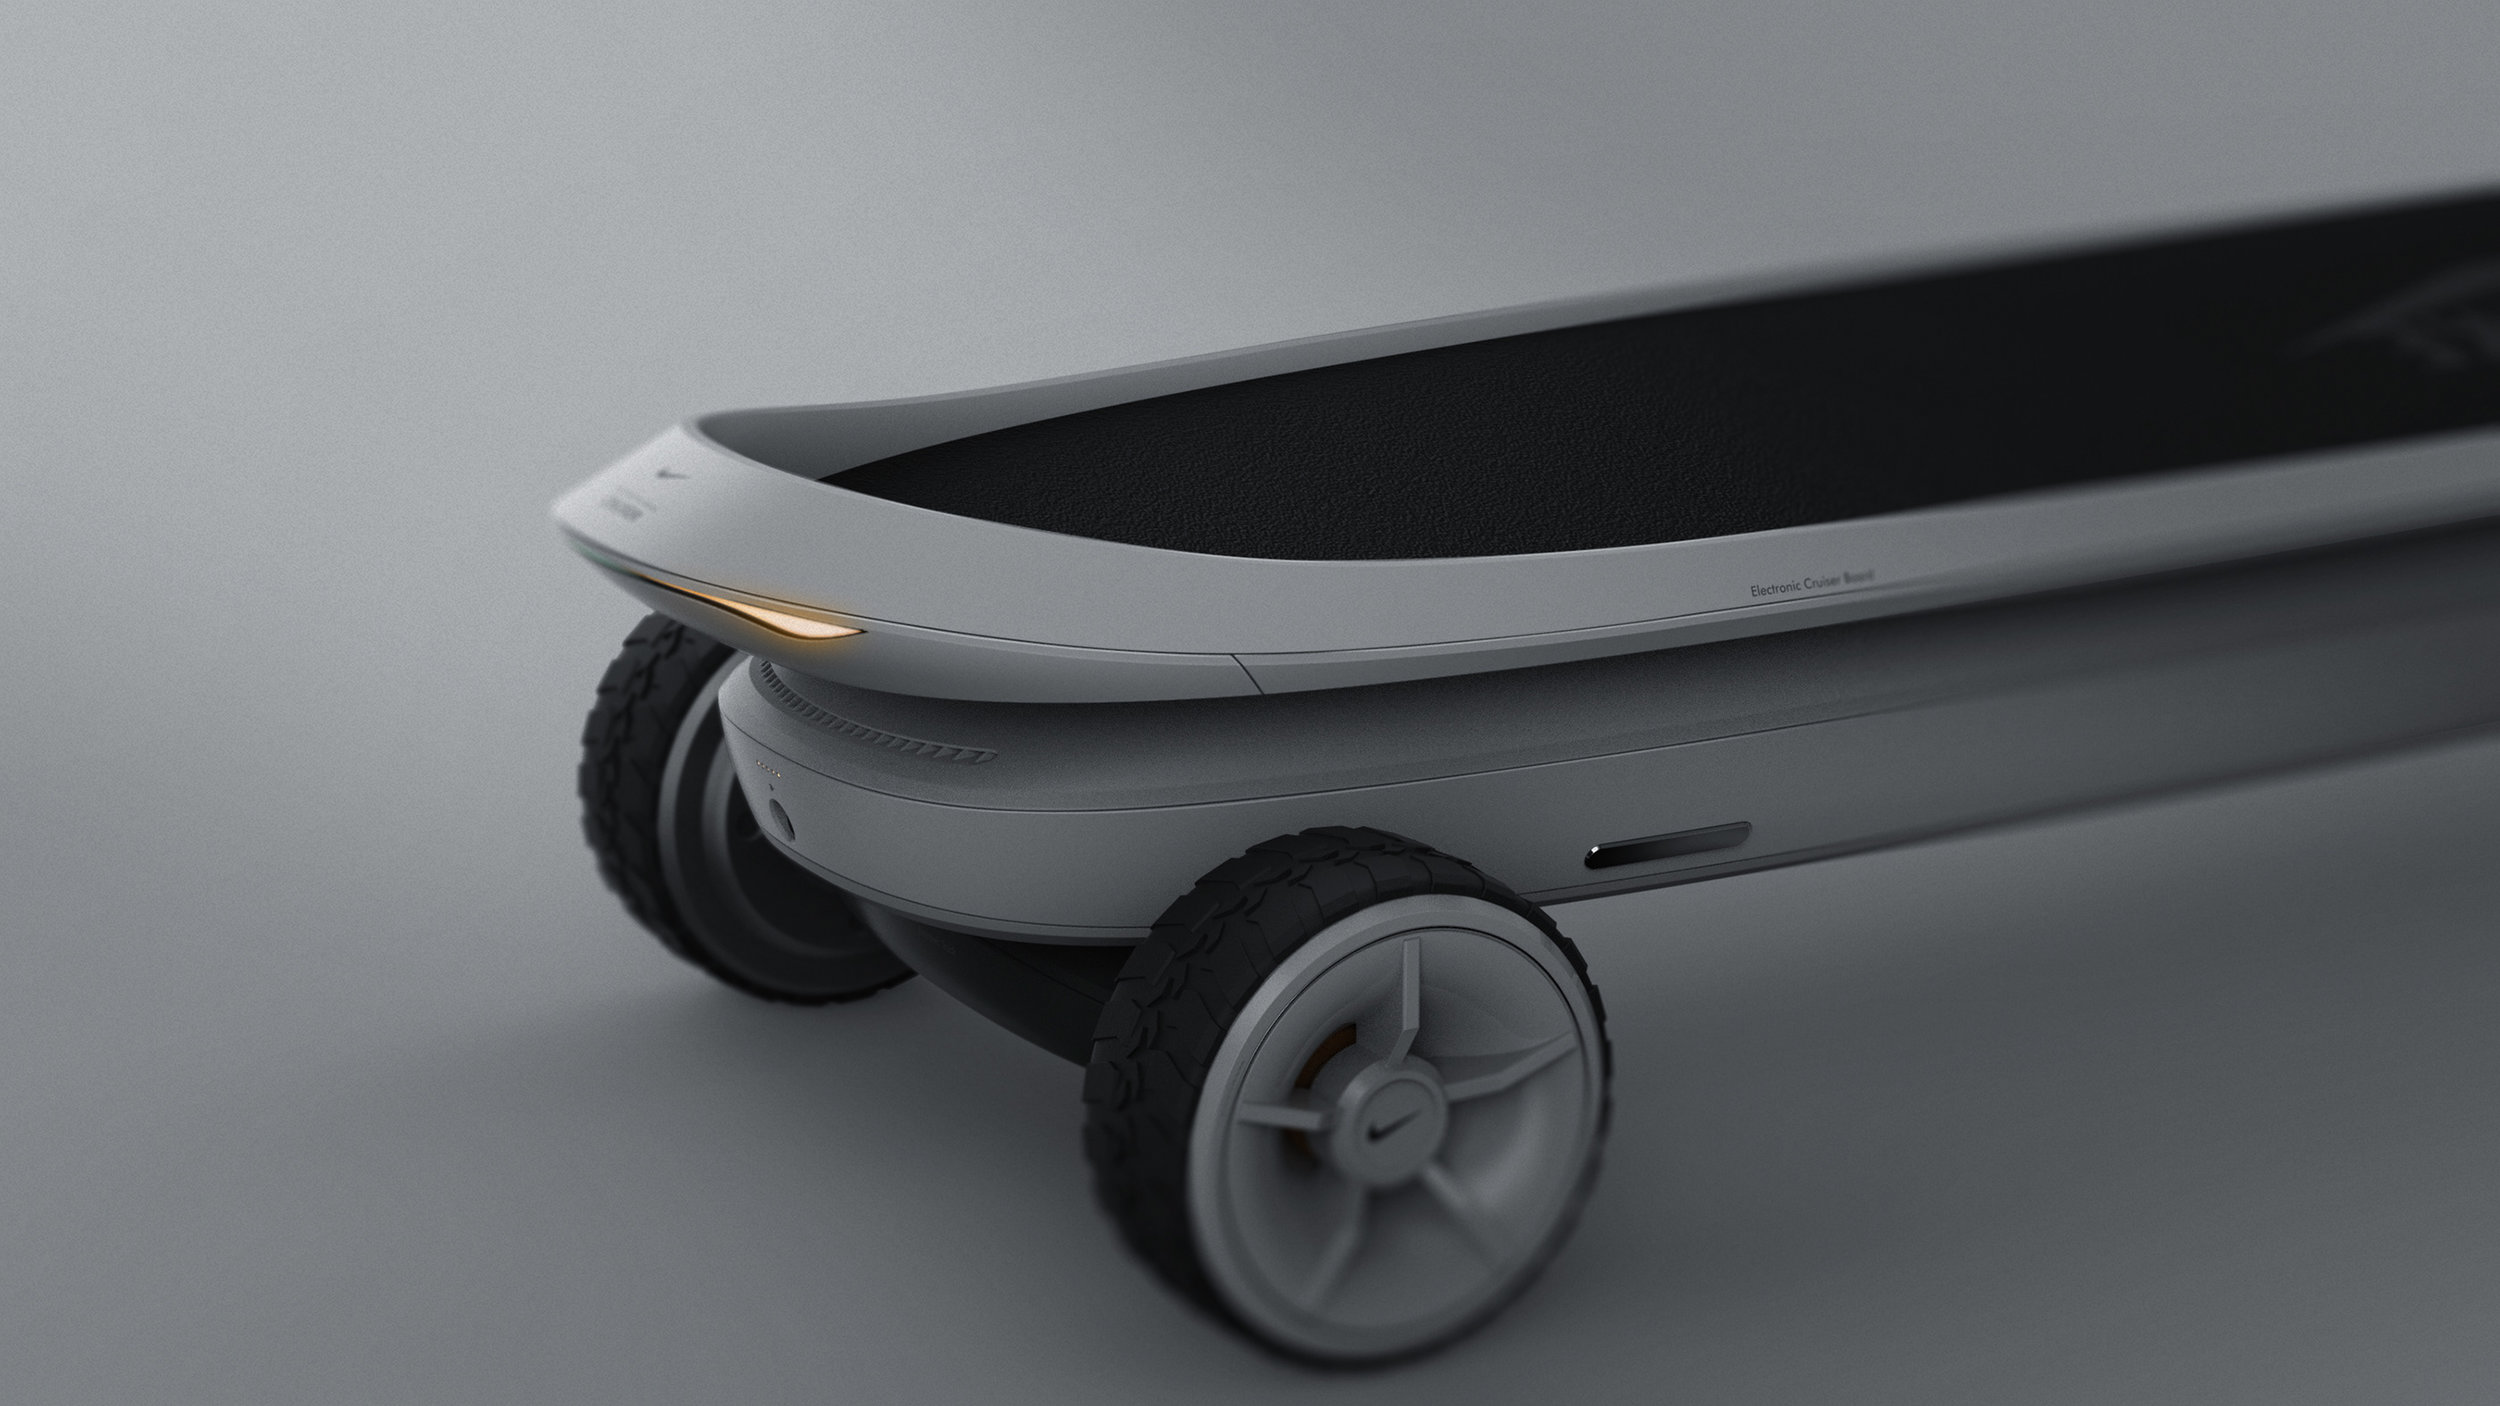 electric-scooter-jaehyuk-lim-07.jpg